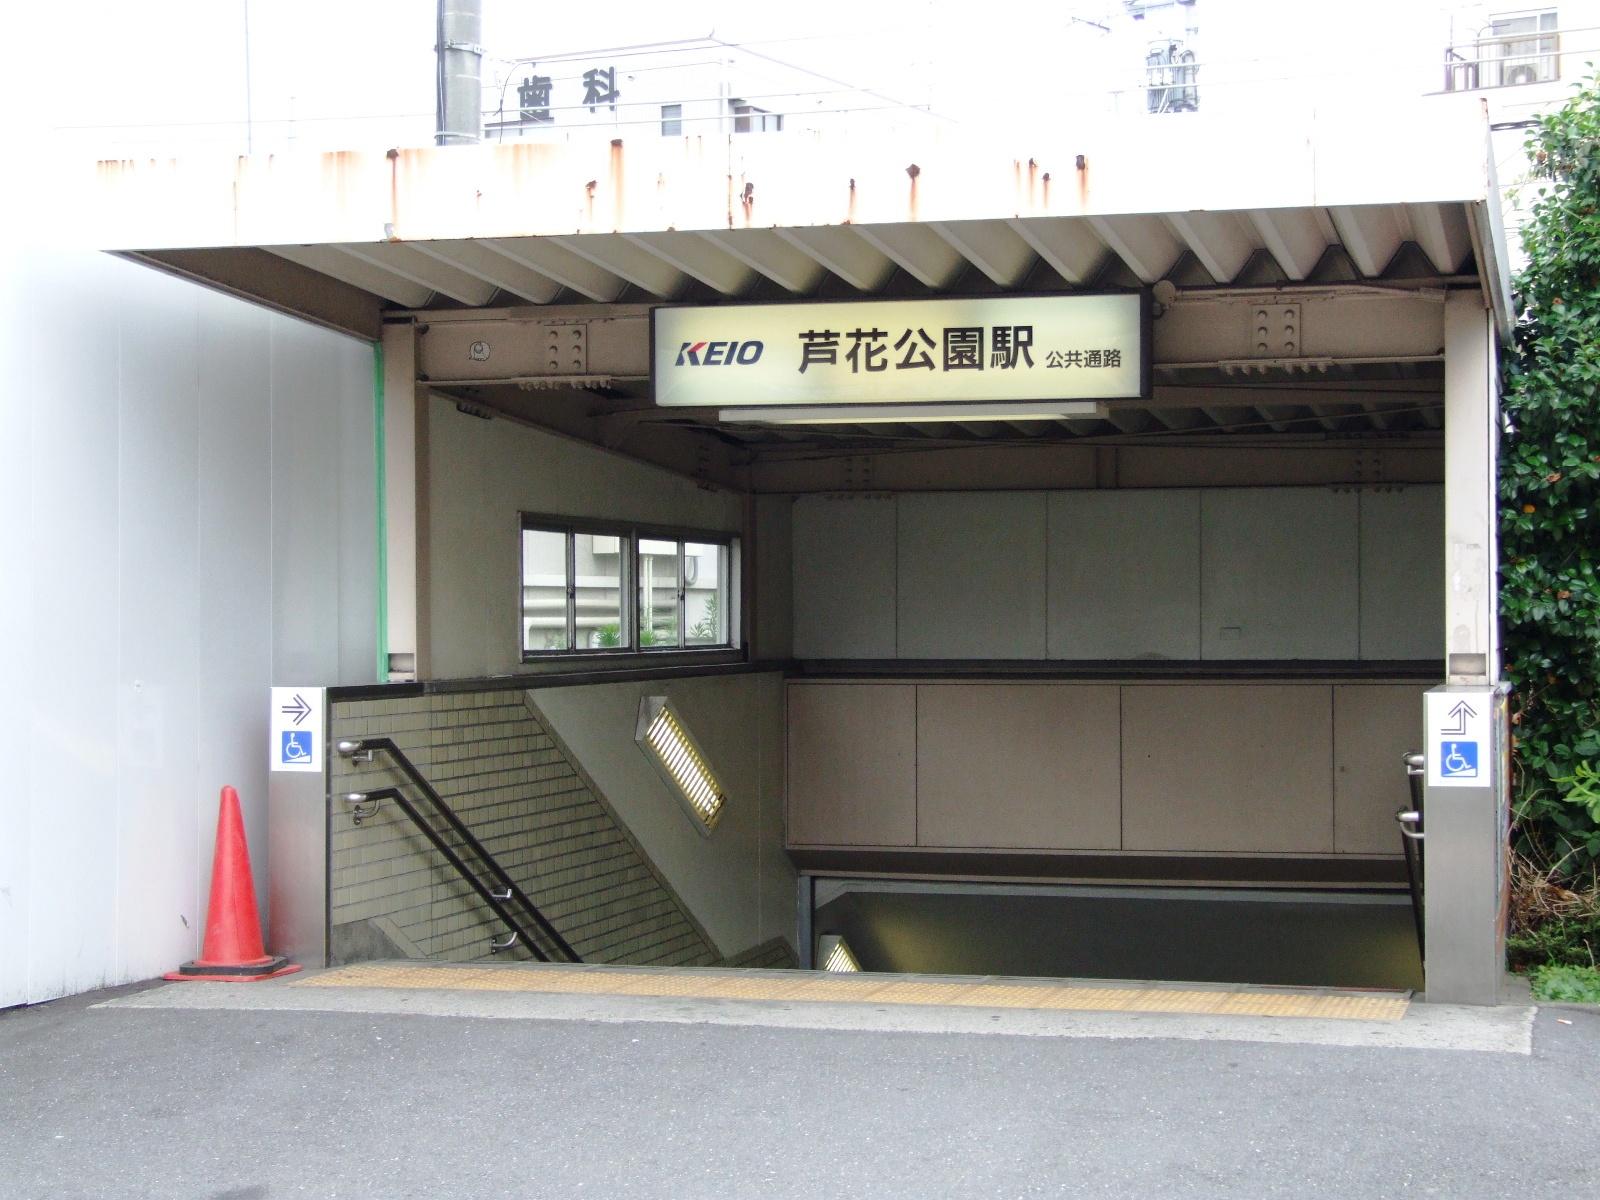 https://upload.wikimedia.org/wikipedia/commons/7/75/Keio_Roka-k%C5%8Den_station_South.jpg